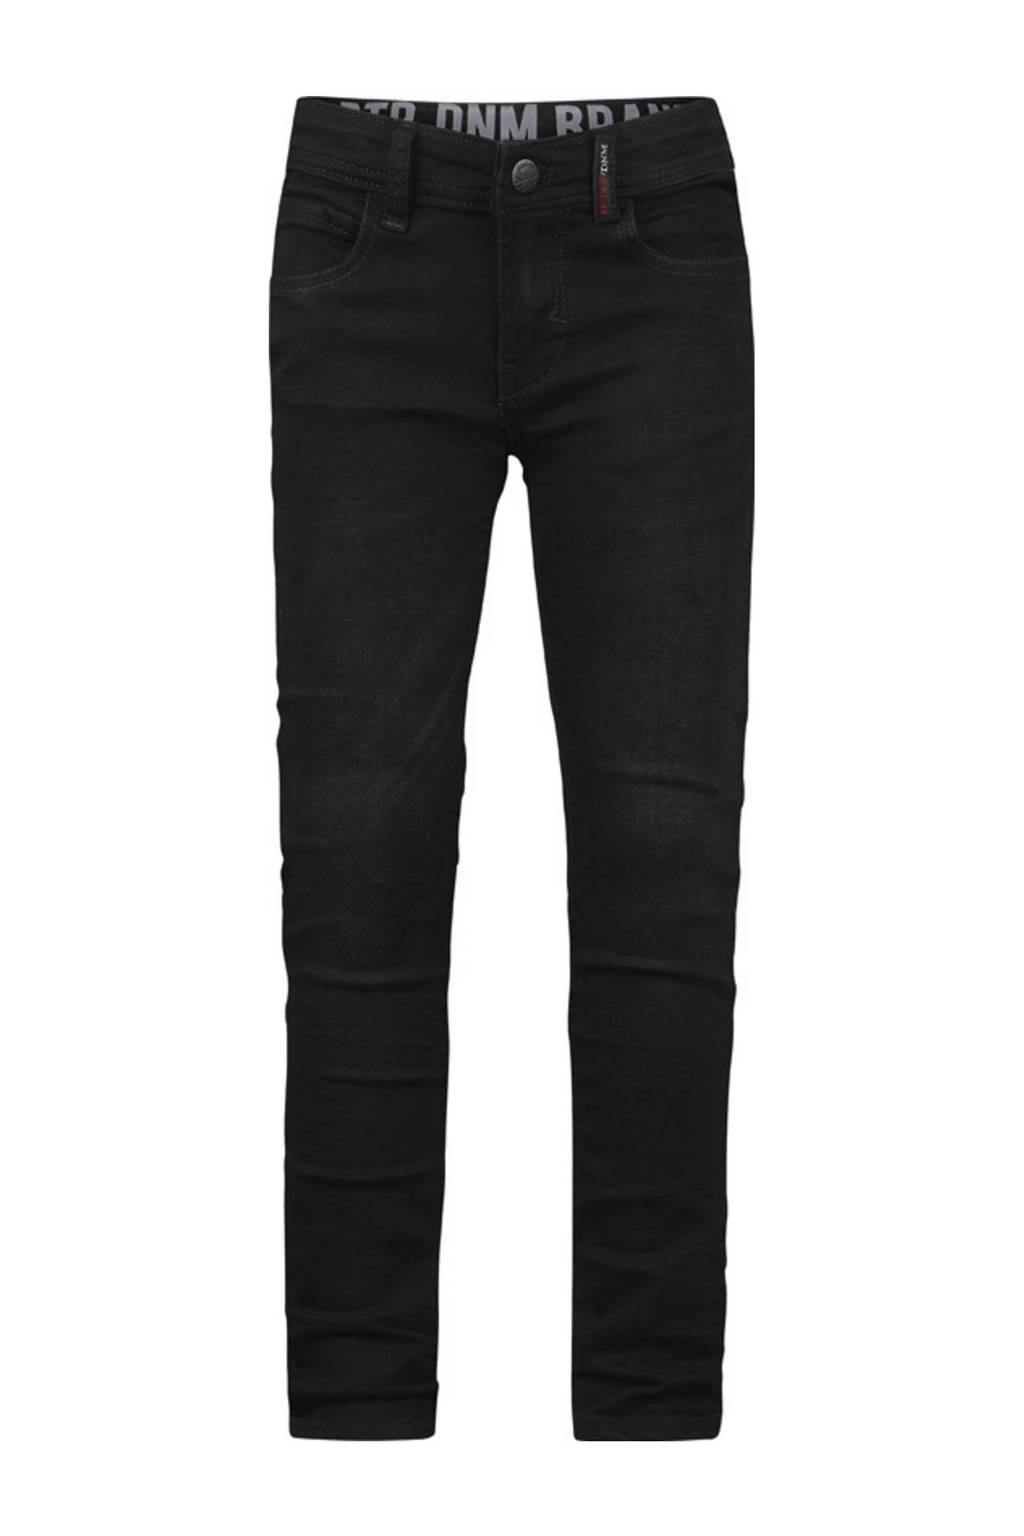 Retour Denim skinny fit jeans Tobias black denim, Black denim